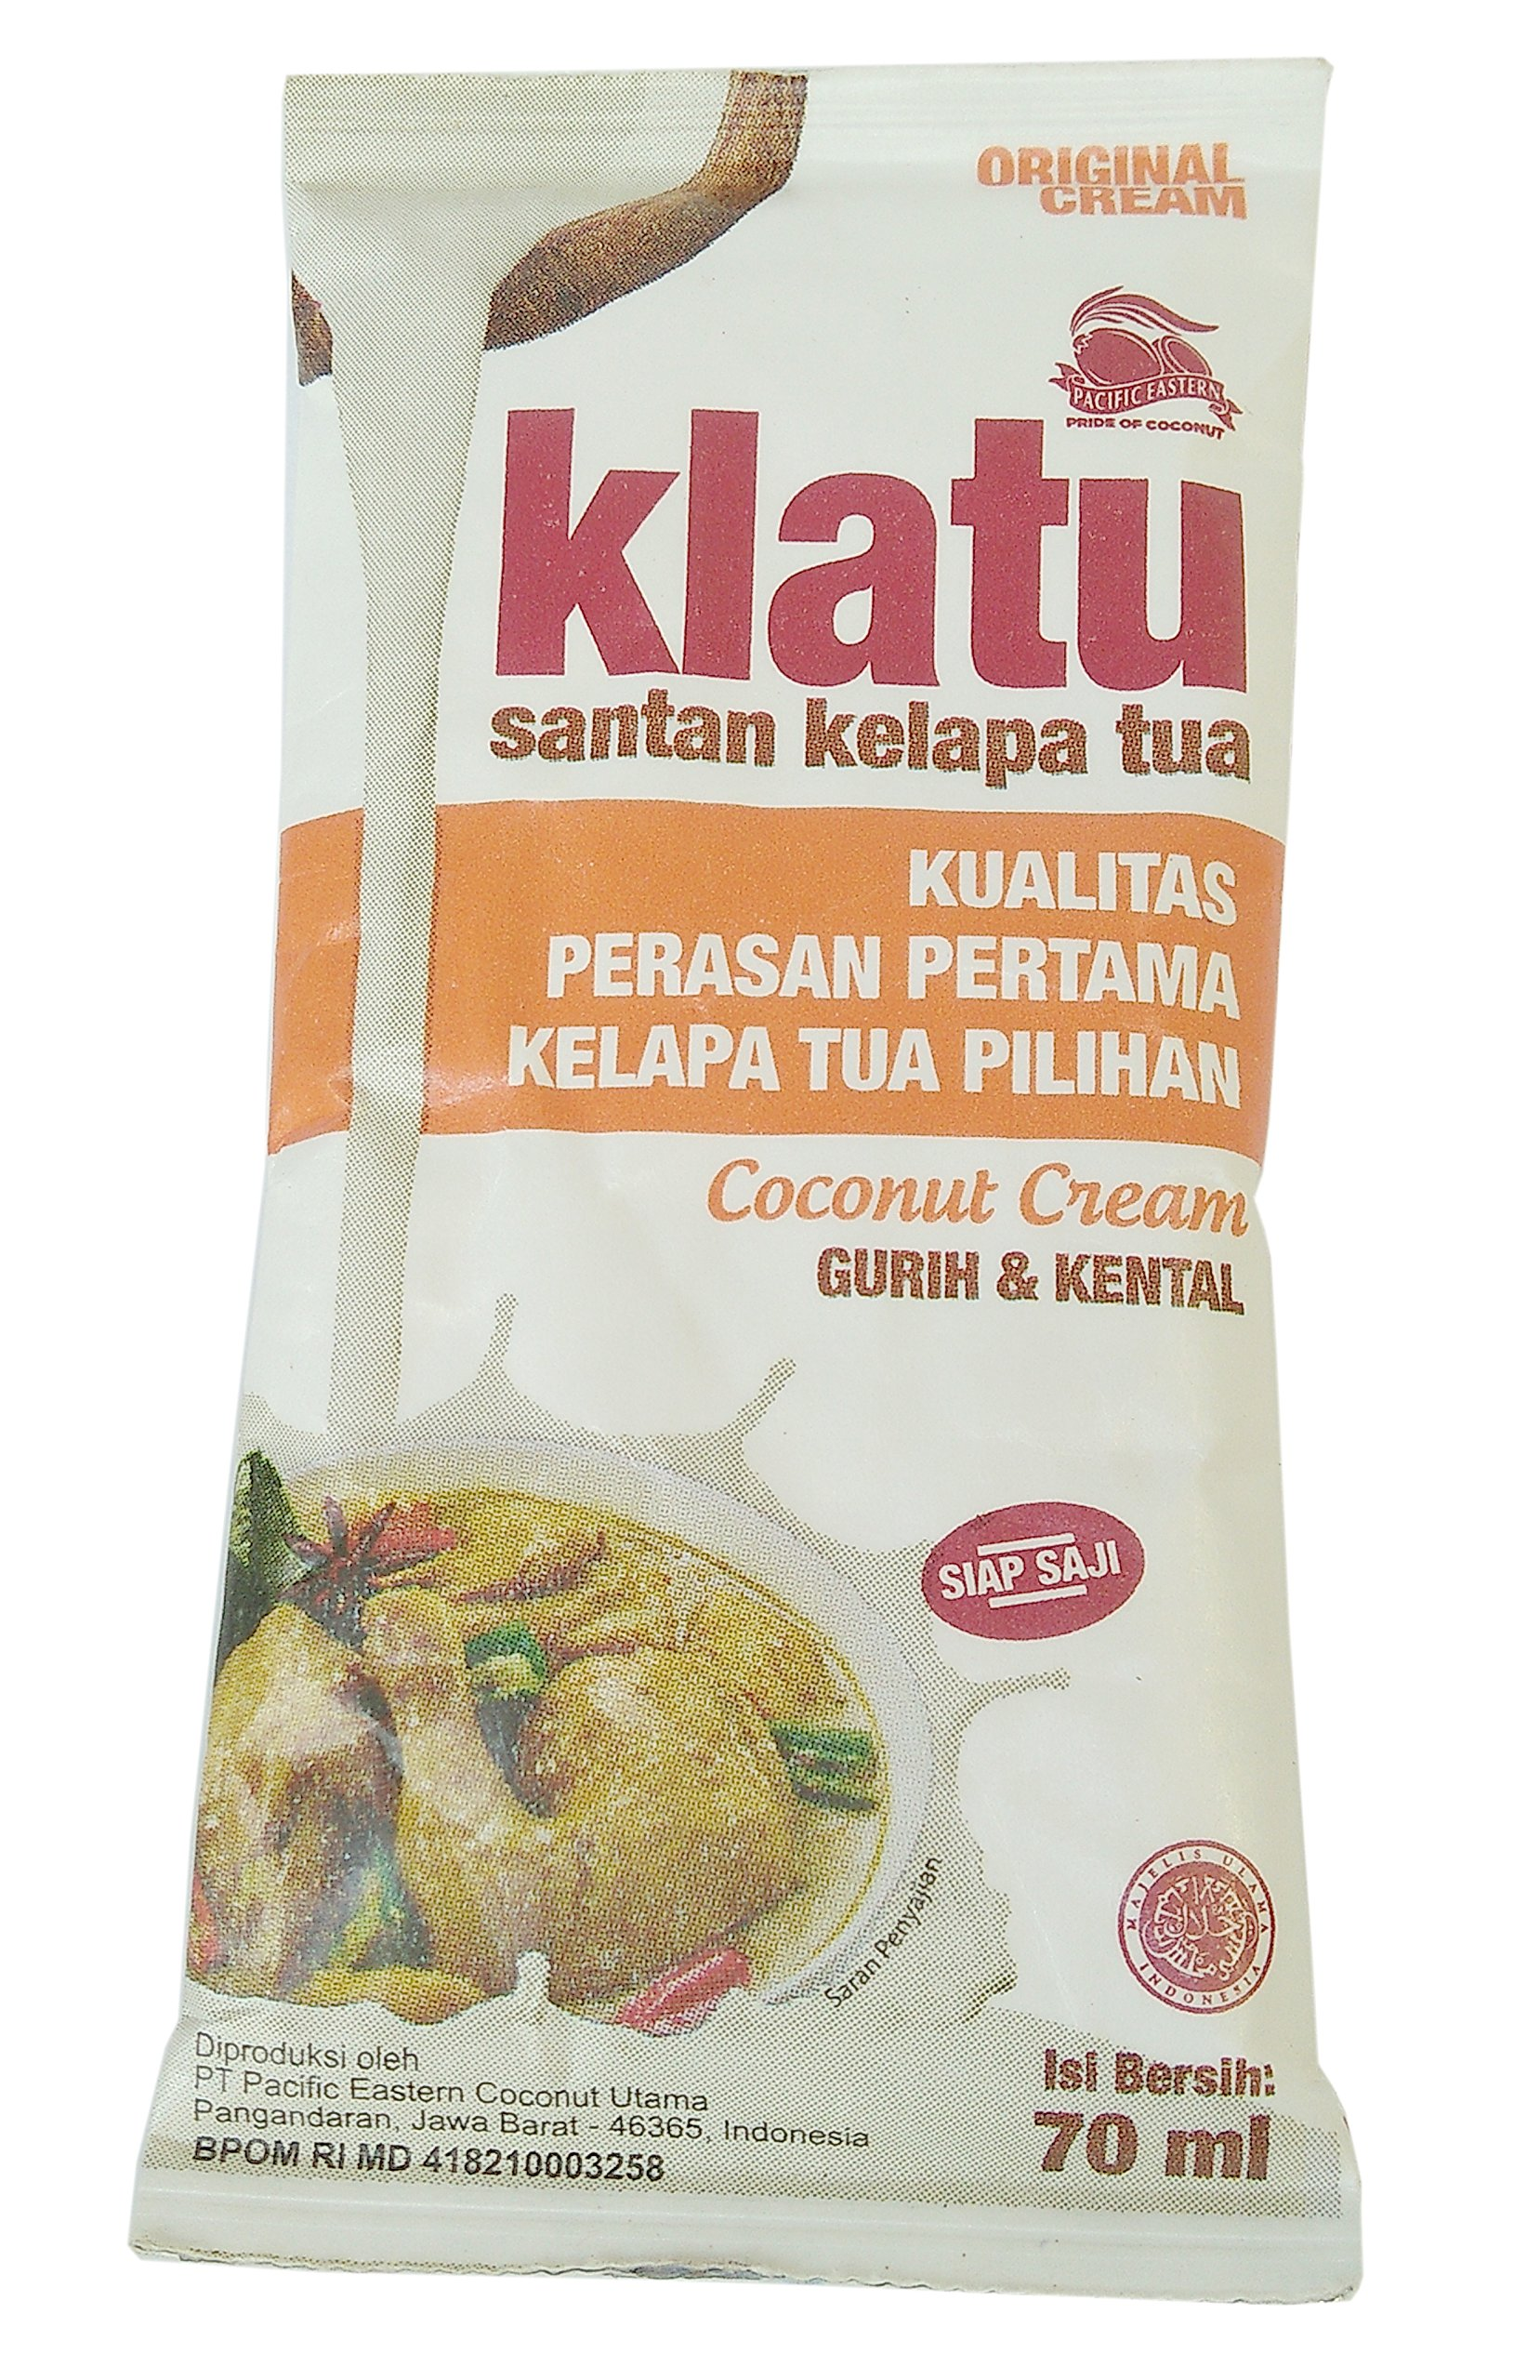 Klatu Santan Kelapa Tua - Coconut Cream Powder, 70ml (Pack of 36) by Klatu (Image #1)